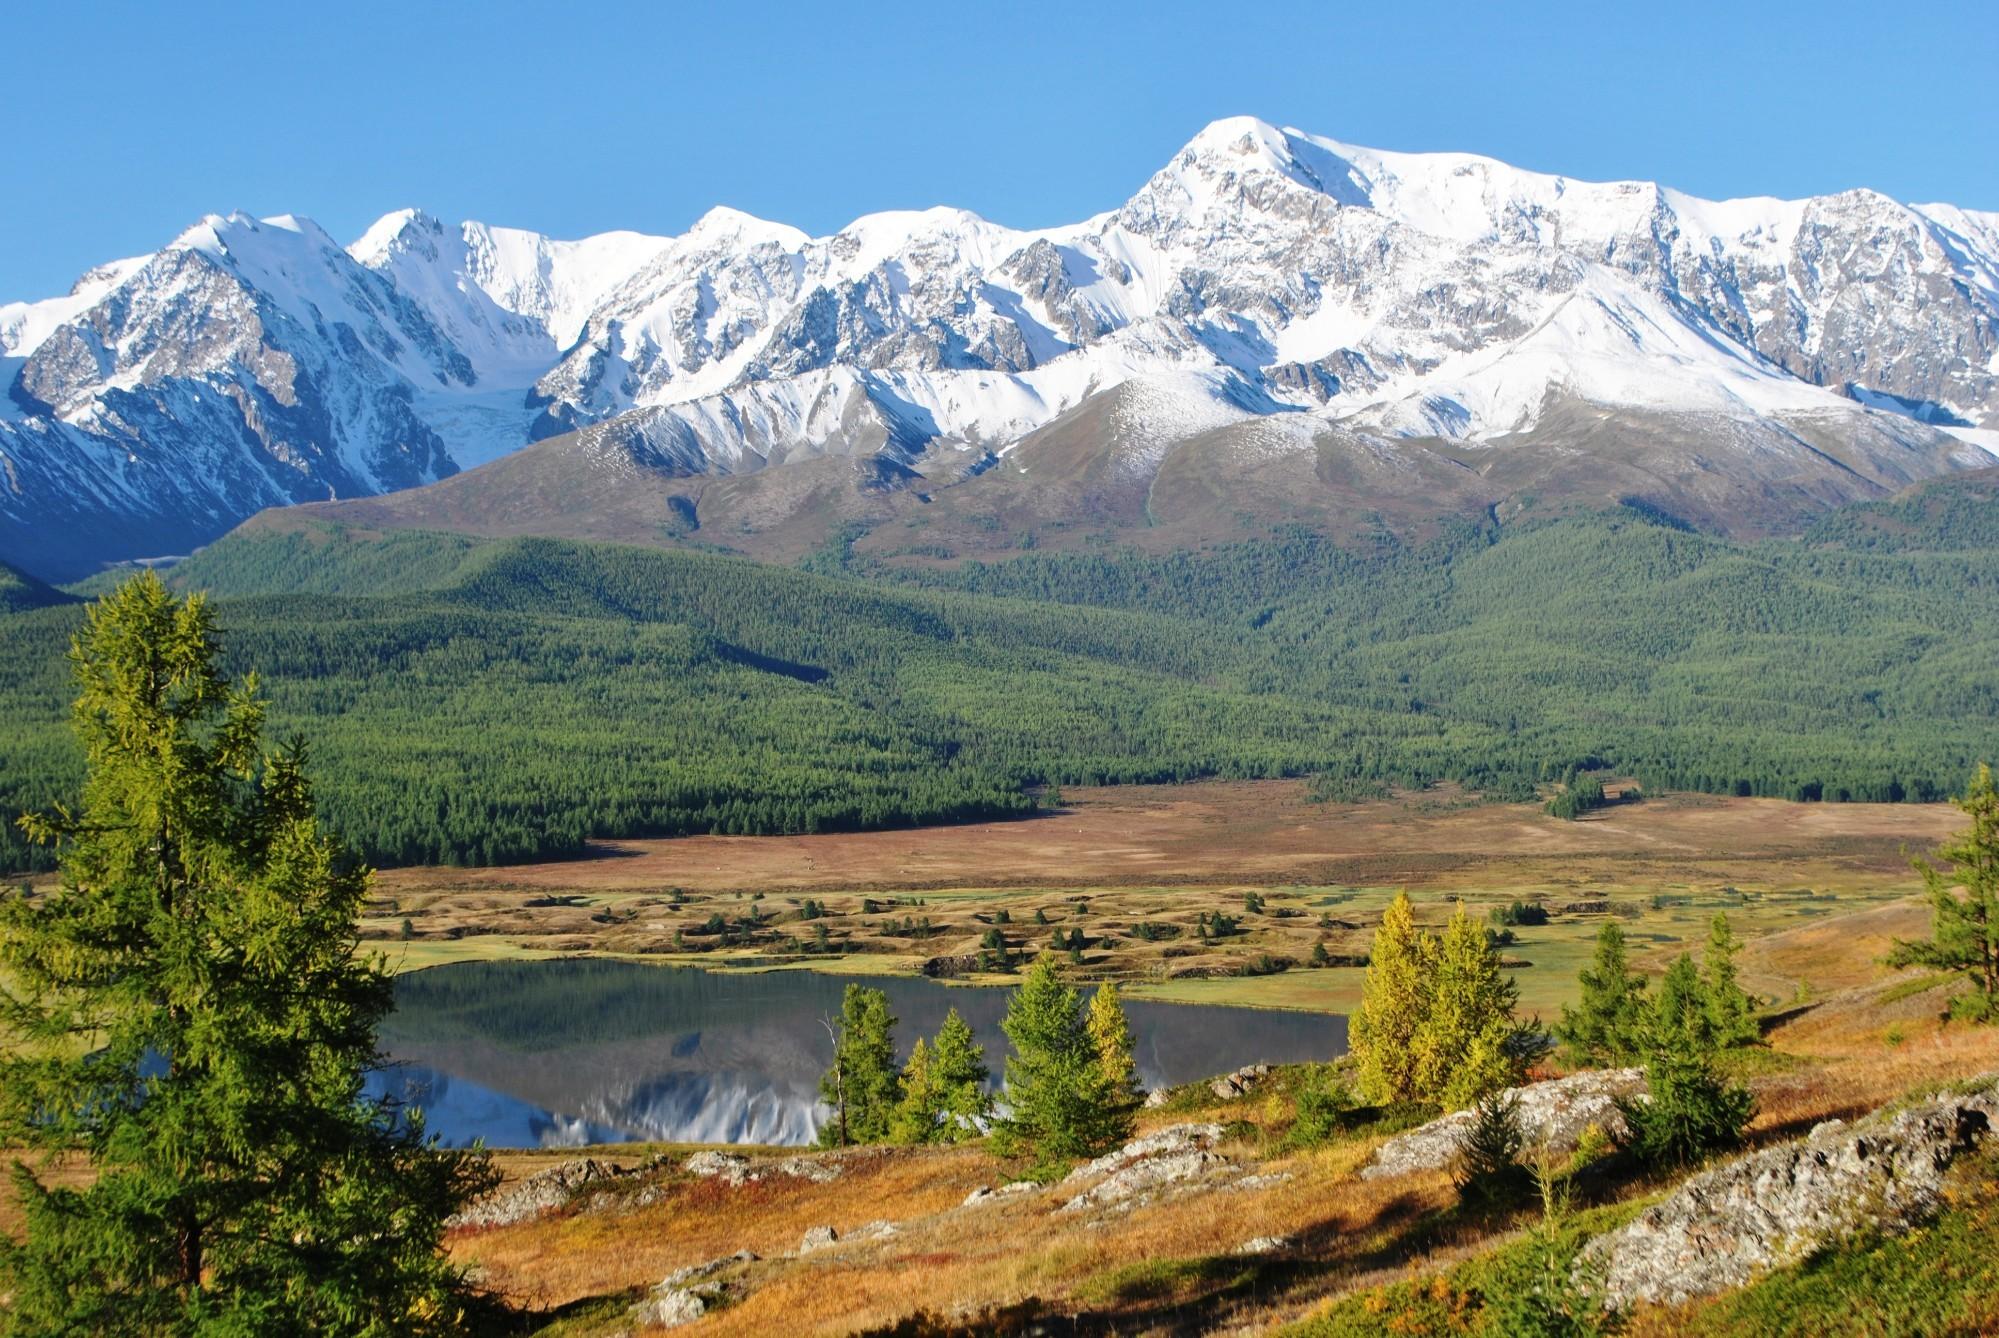 31 - 10 locais no Altay que vale a pena visitar